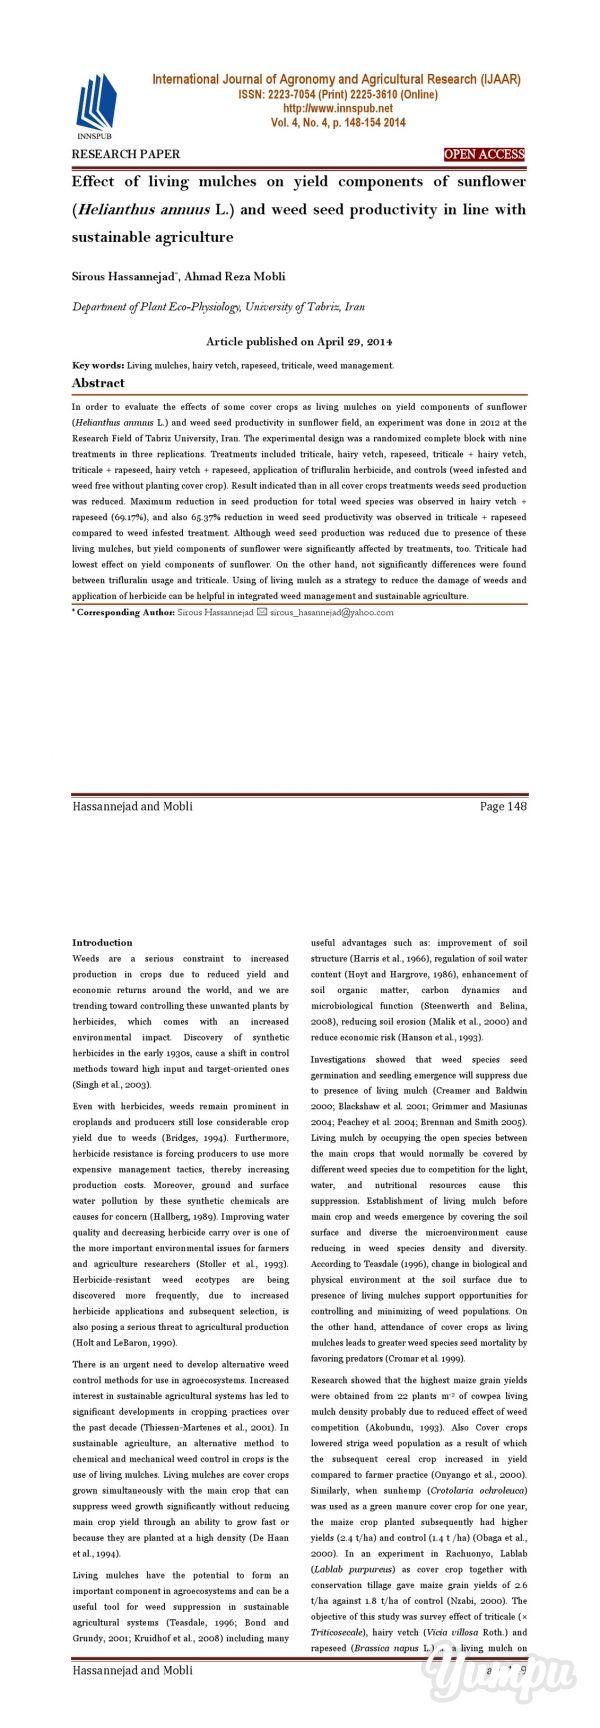 essay philosophical remembering socrates